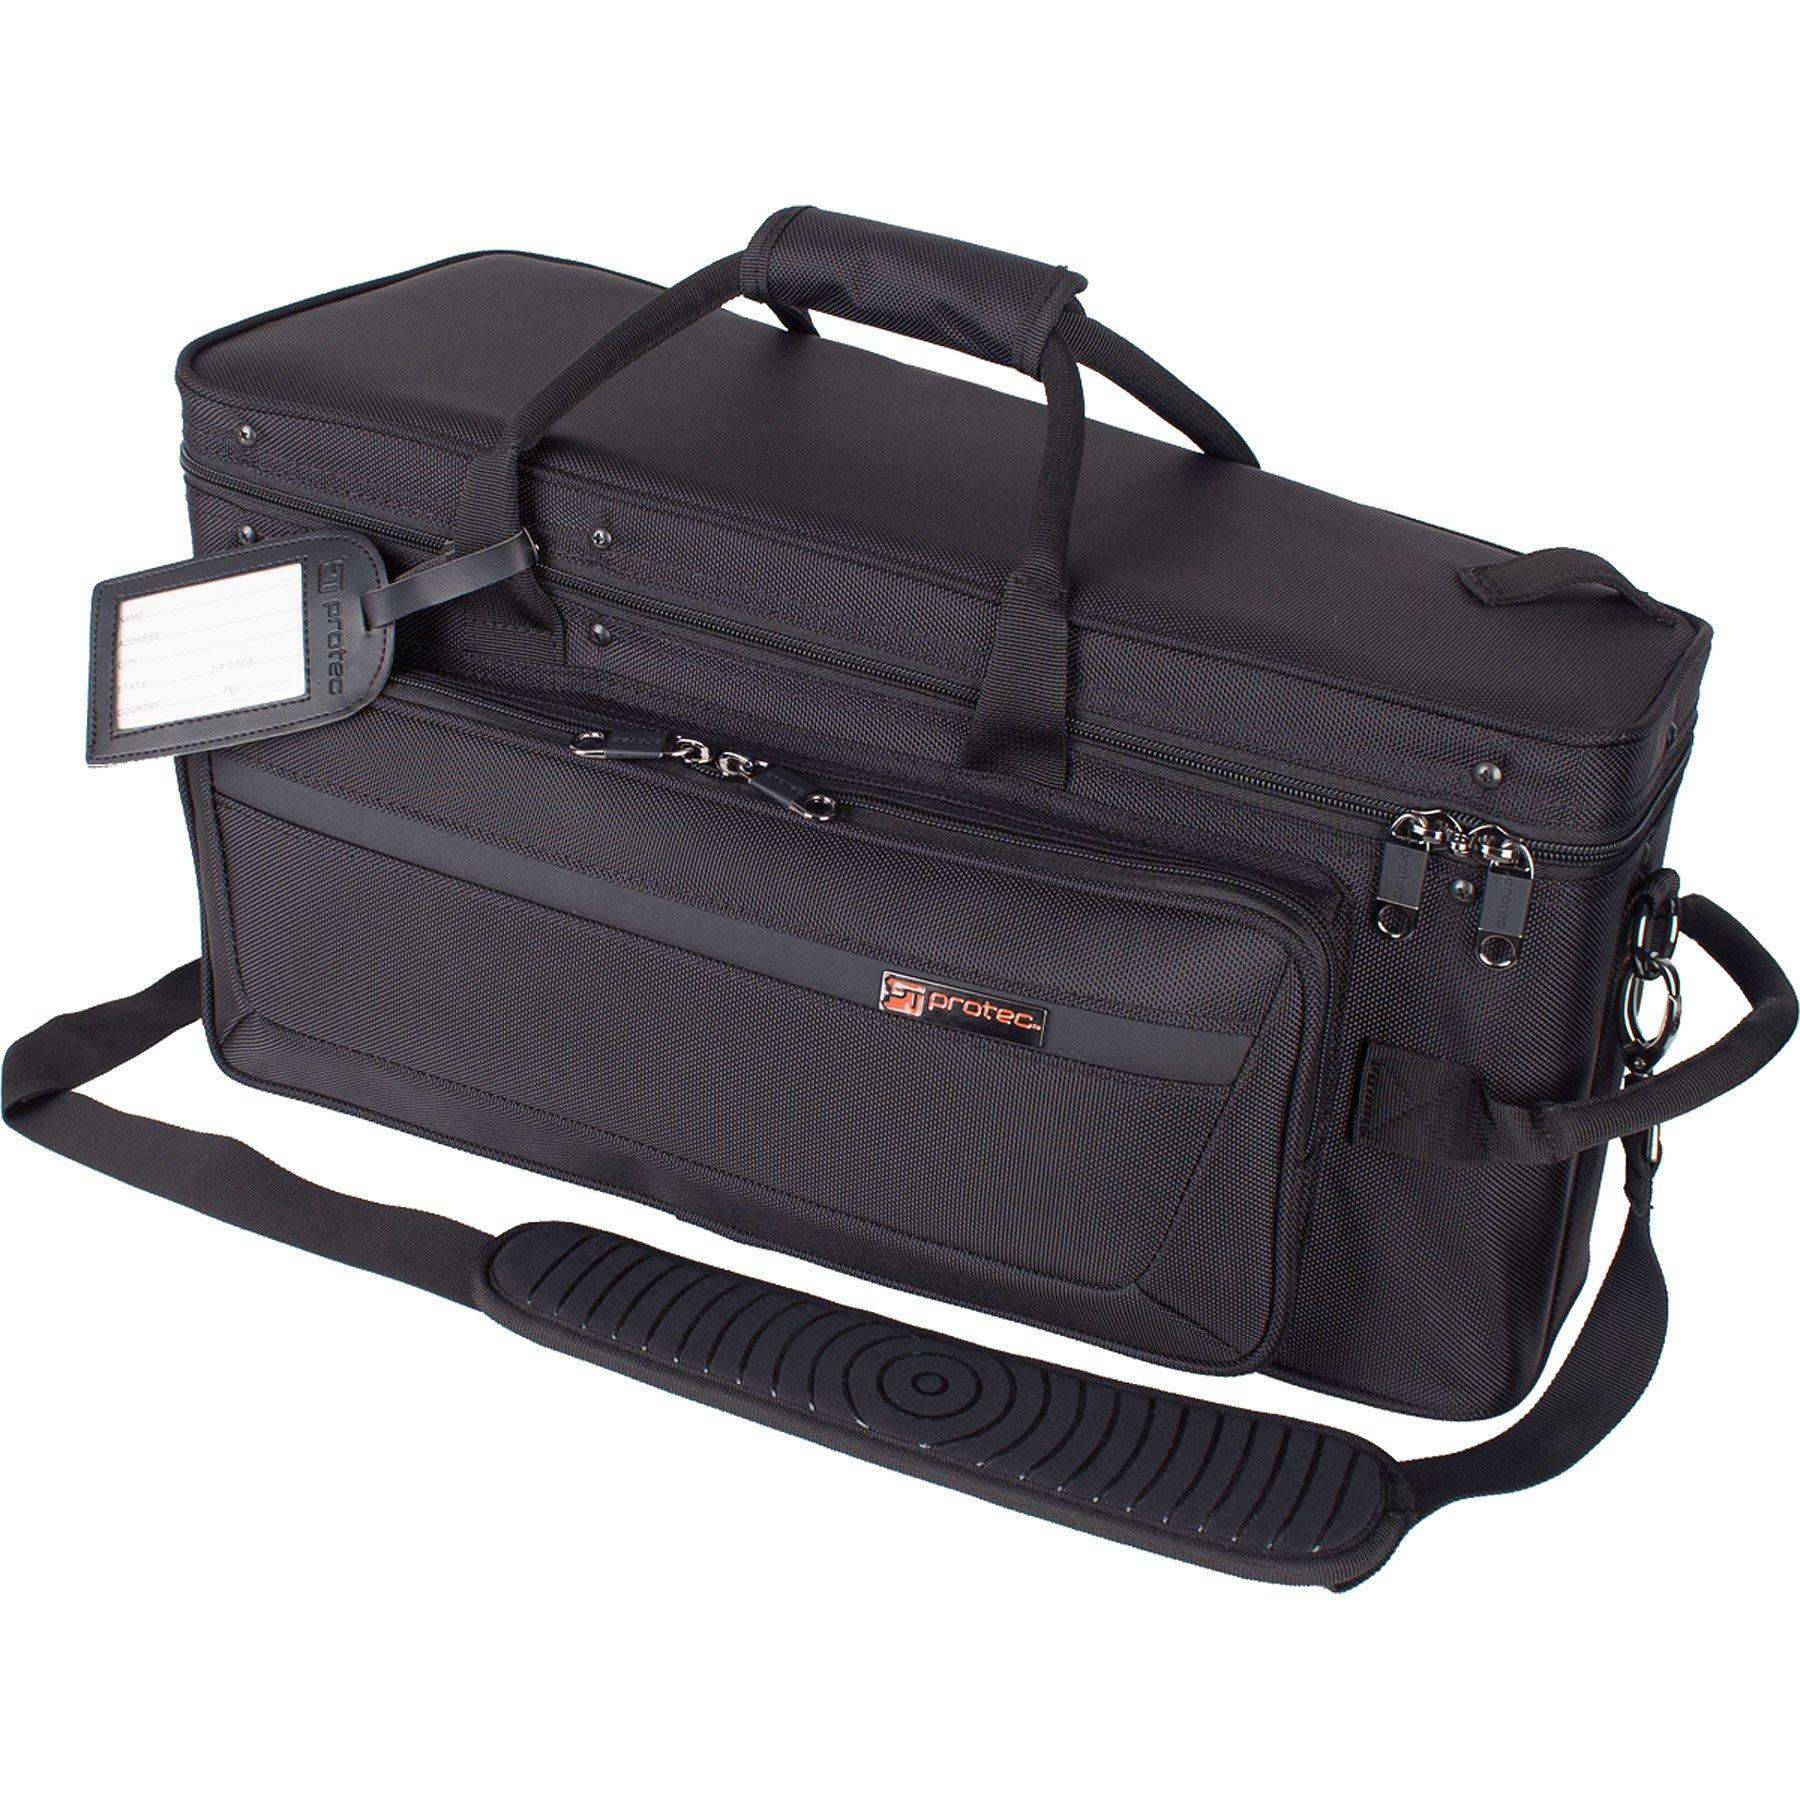 Protec Flugelhorn PRO PAC Case